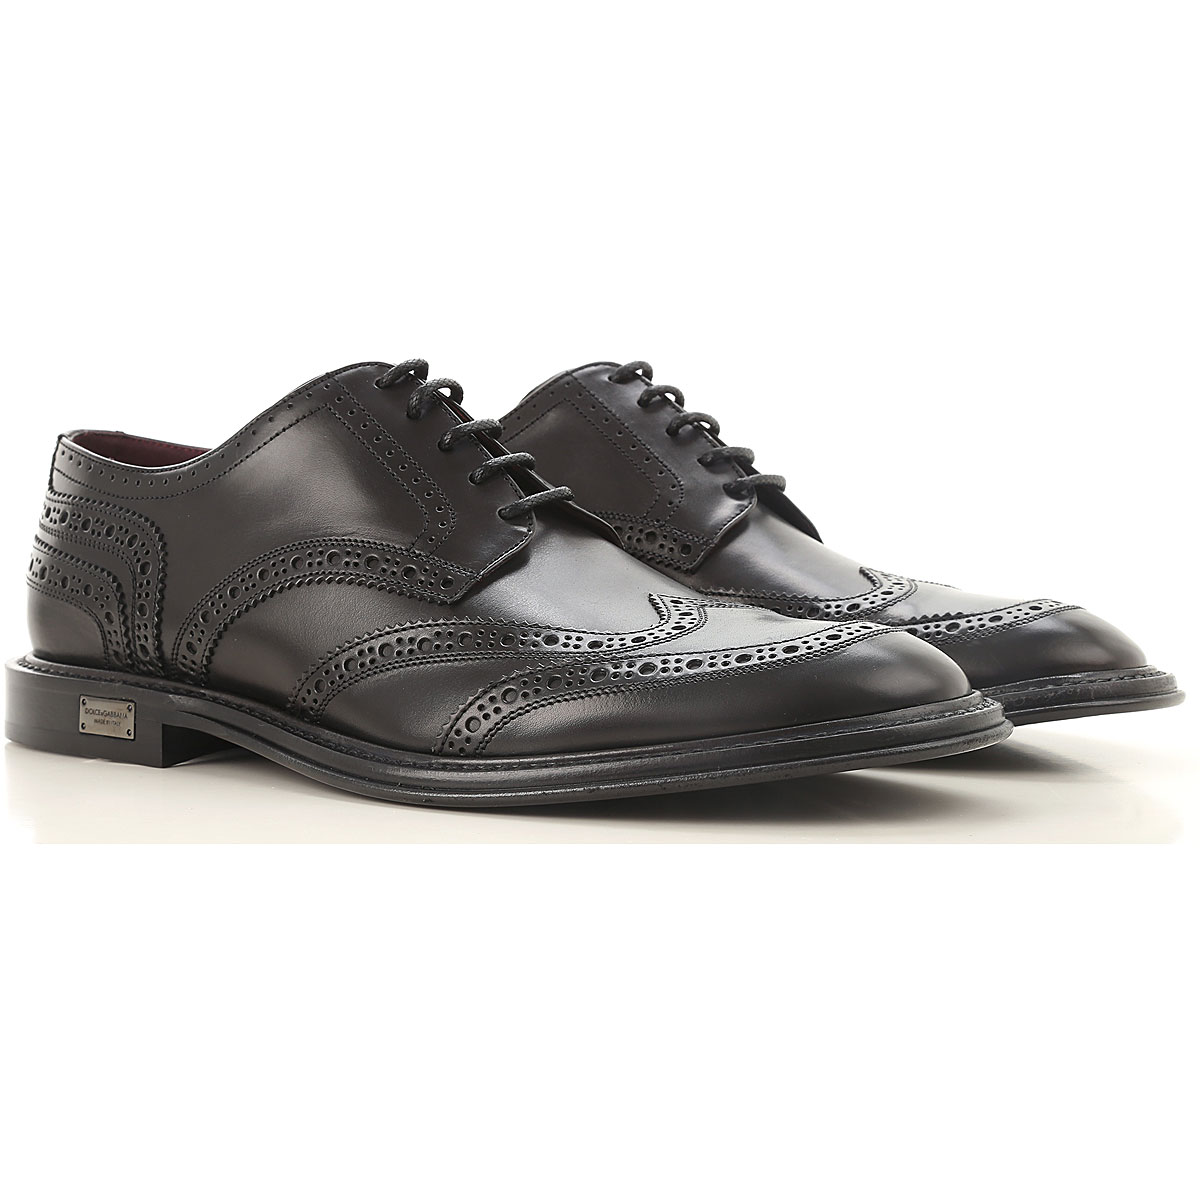 Dolce & Gabbana Brogue Shoes, Black, Leather, 2017, 10 10.5 11.5 7.5 8 8.5 9 9.5